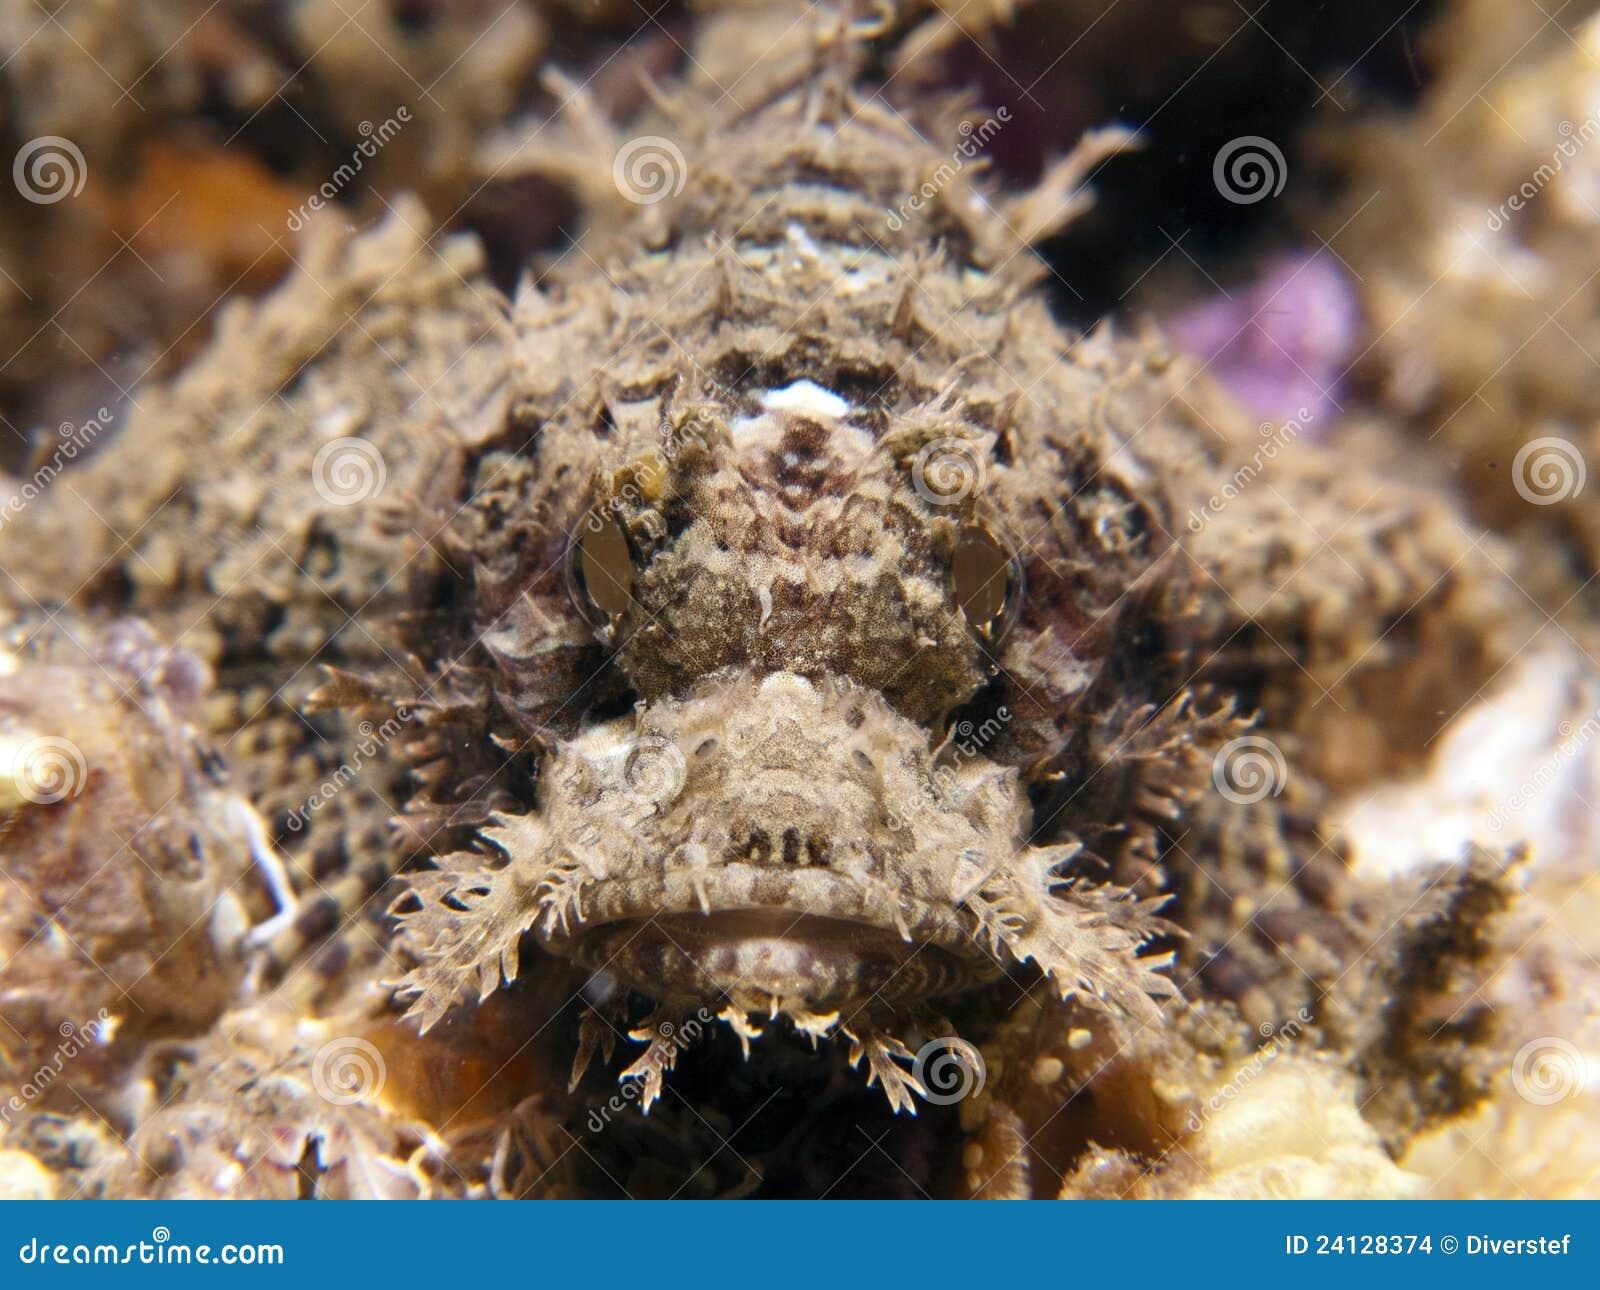 Raggy scorpaenopsis scorpianfish venosa